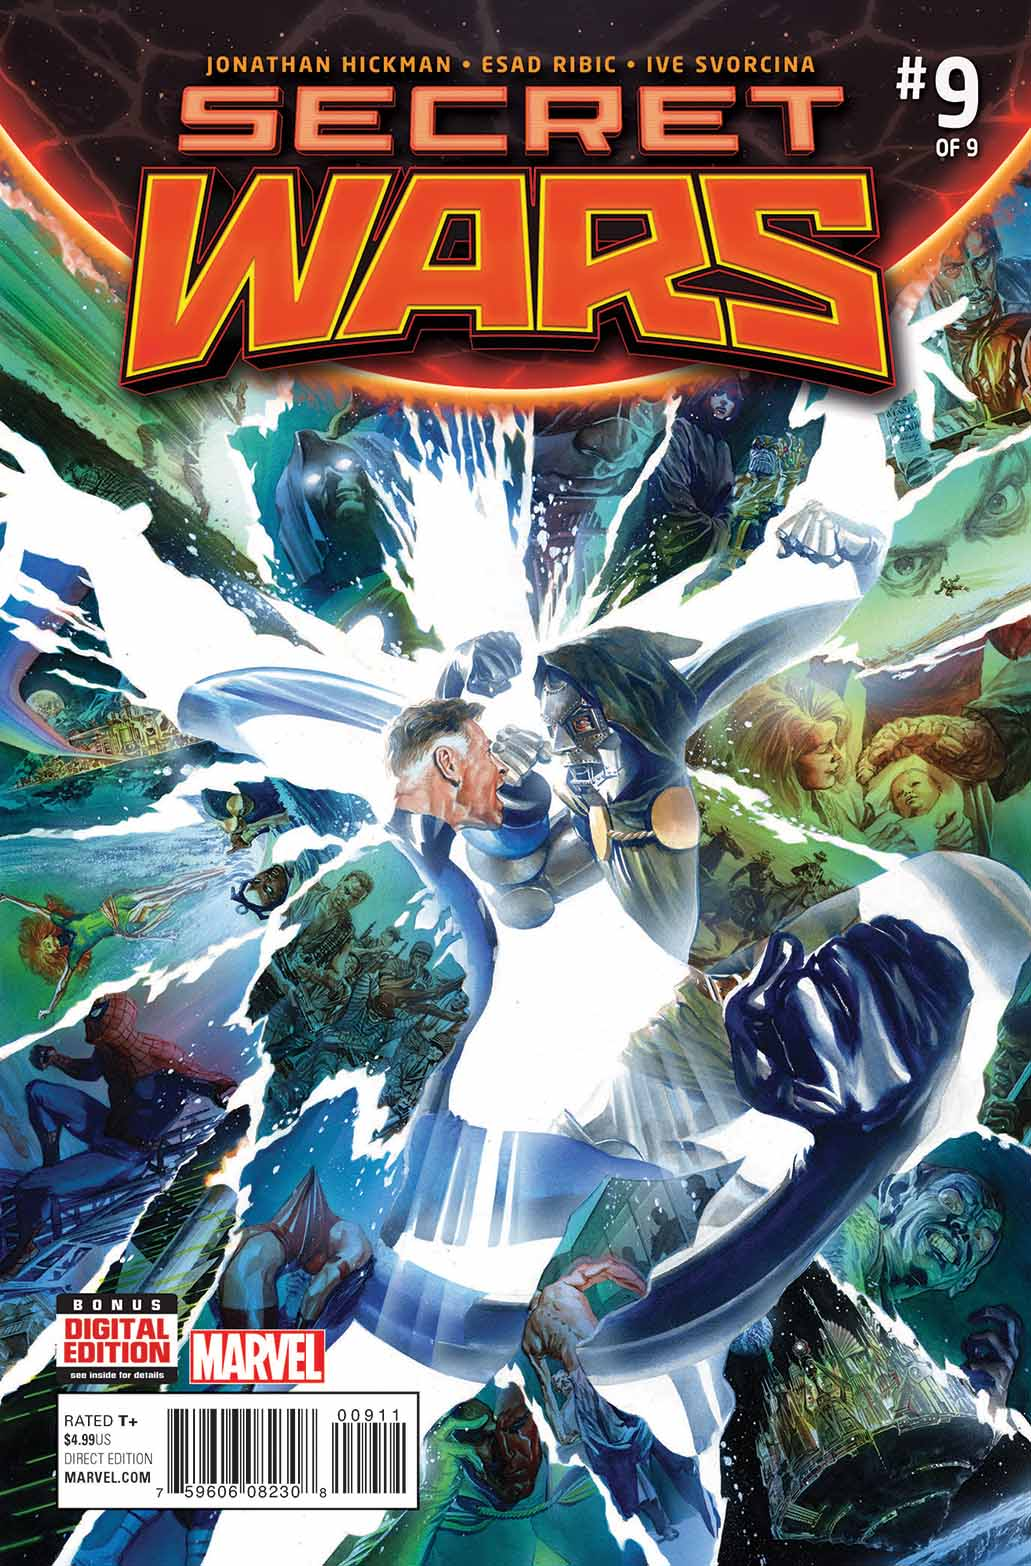 Fantastic Wallpaper Marvel Secret Wars - latest?cb\u003d20151215042029  Image_889743.jpg/revision/latest?cb\u003d20151215042029